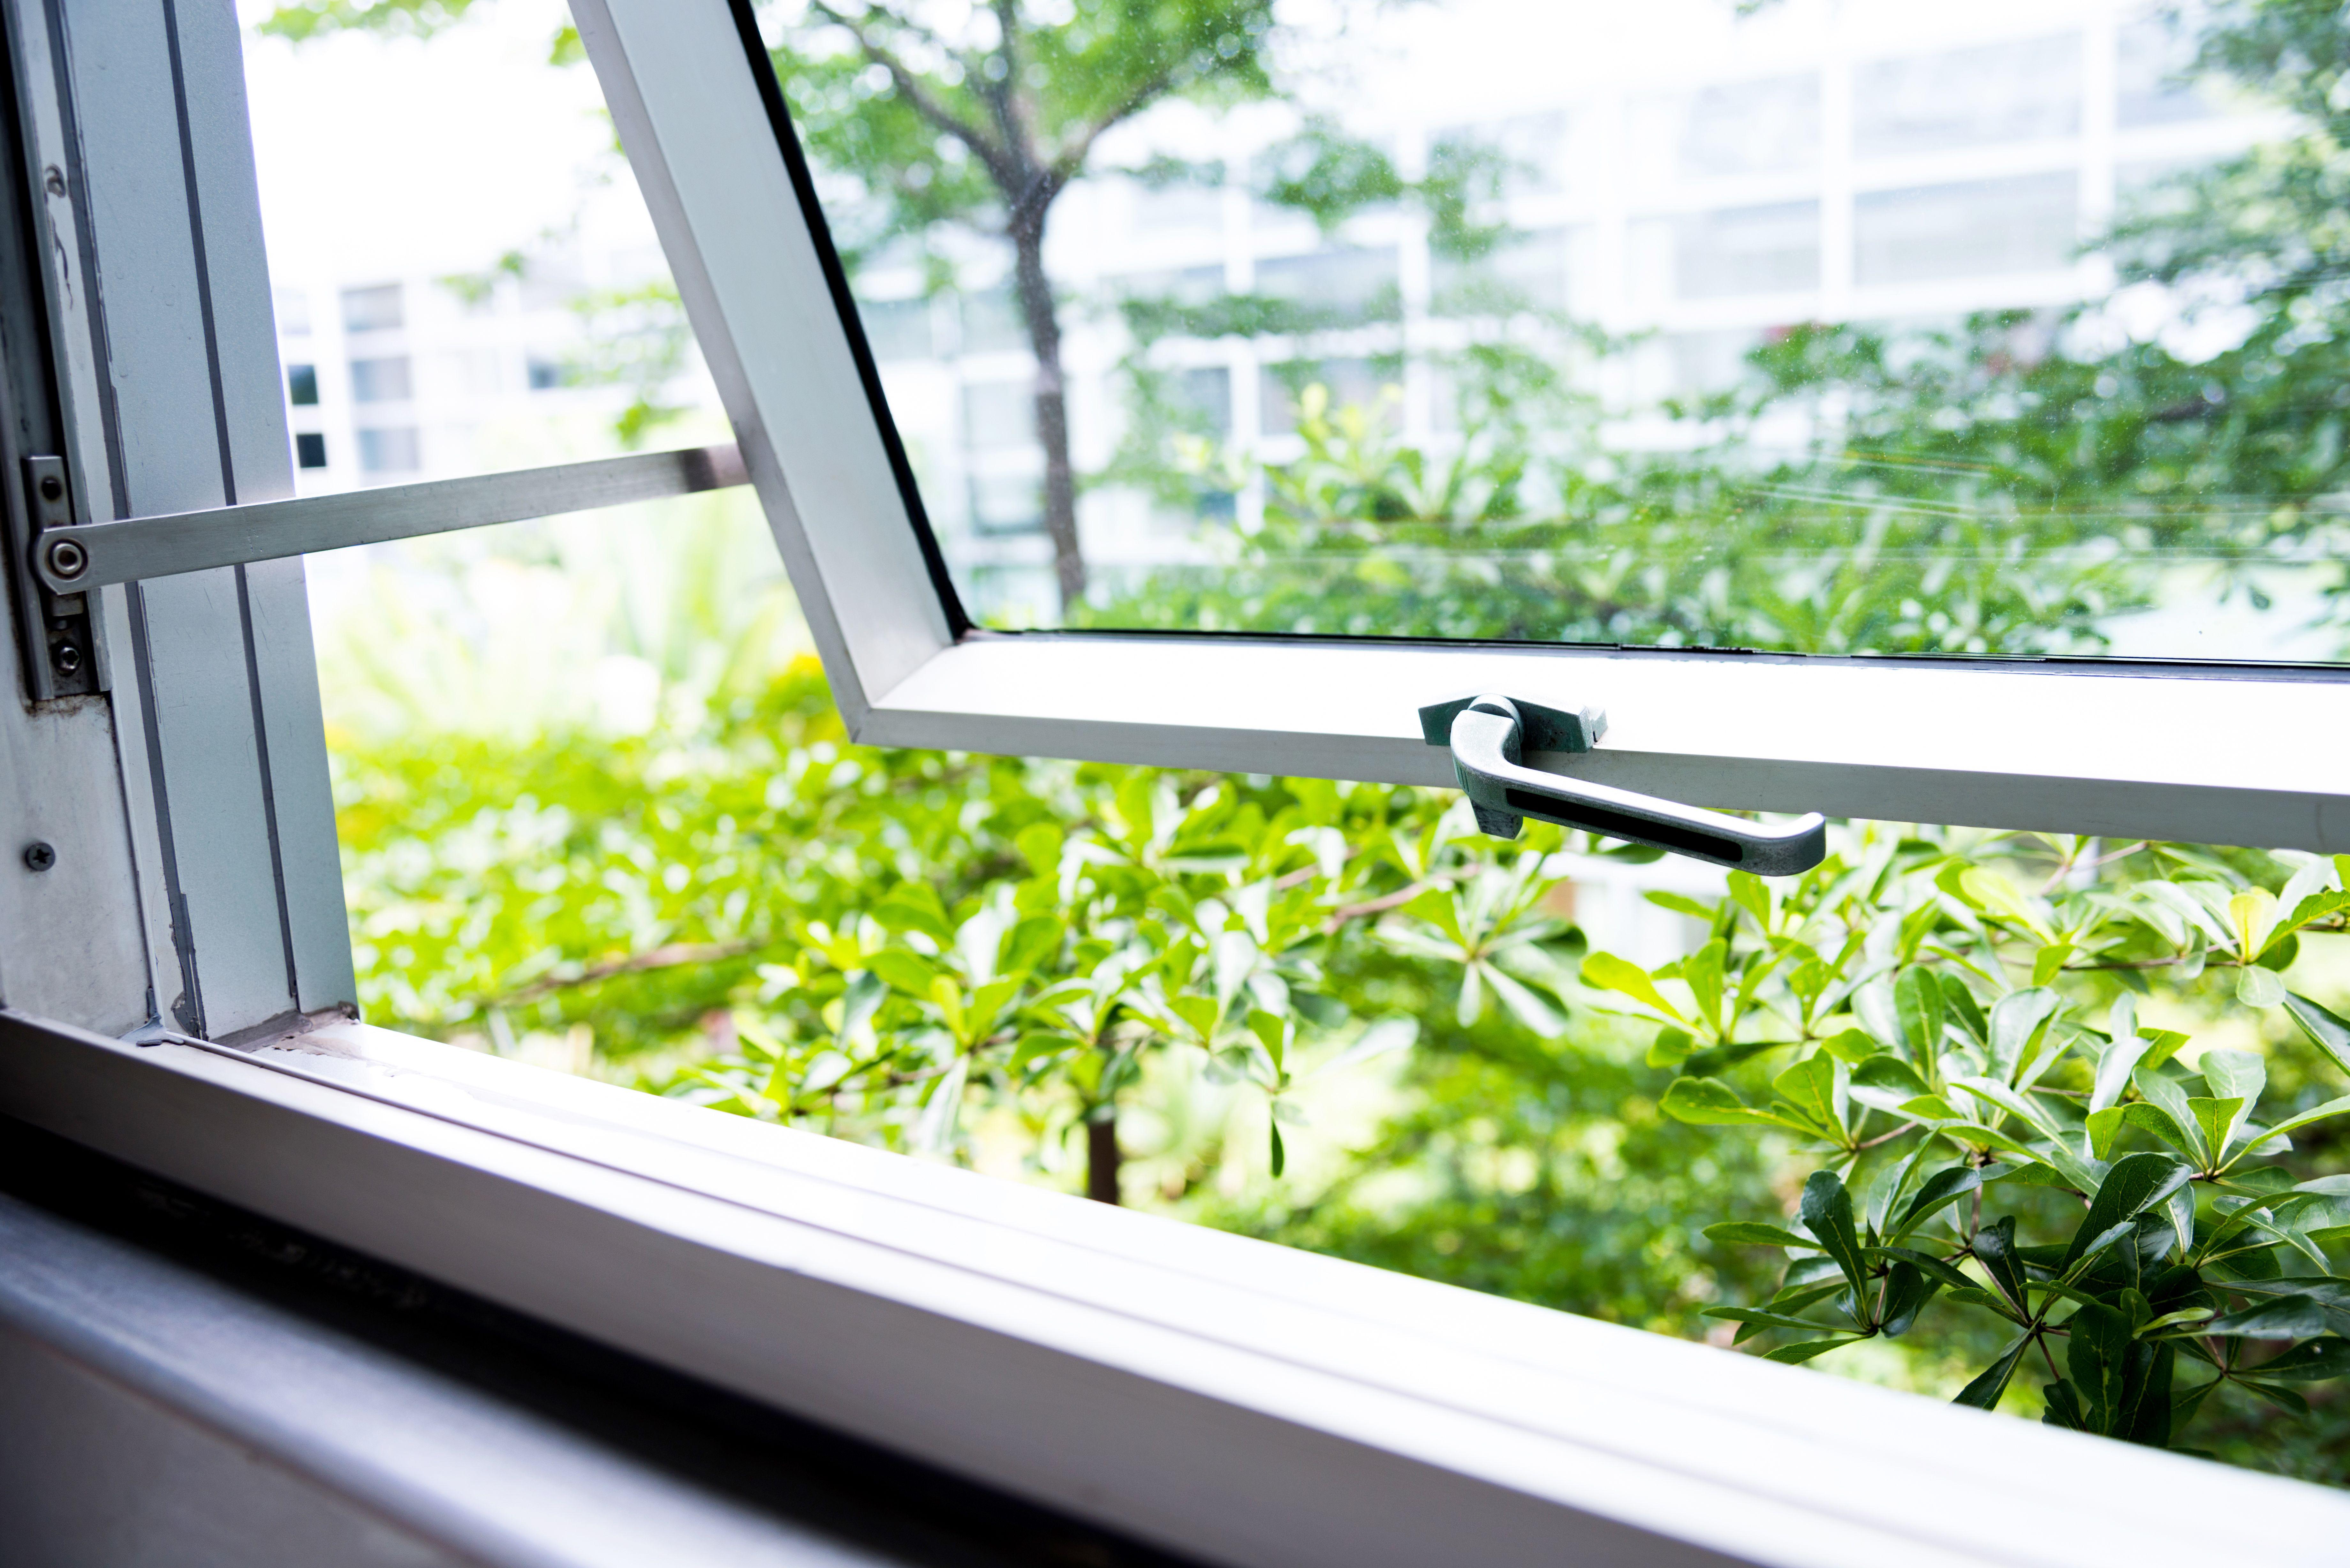 Cooeling Bedroom In Heatwave Single Hung Windows Windows Windows Doors